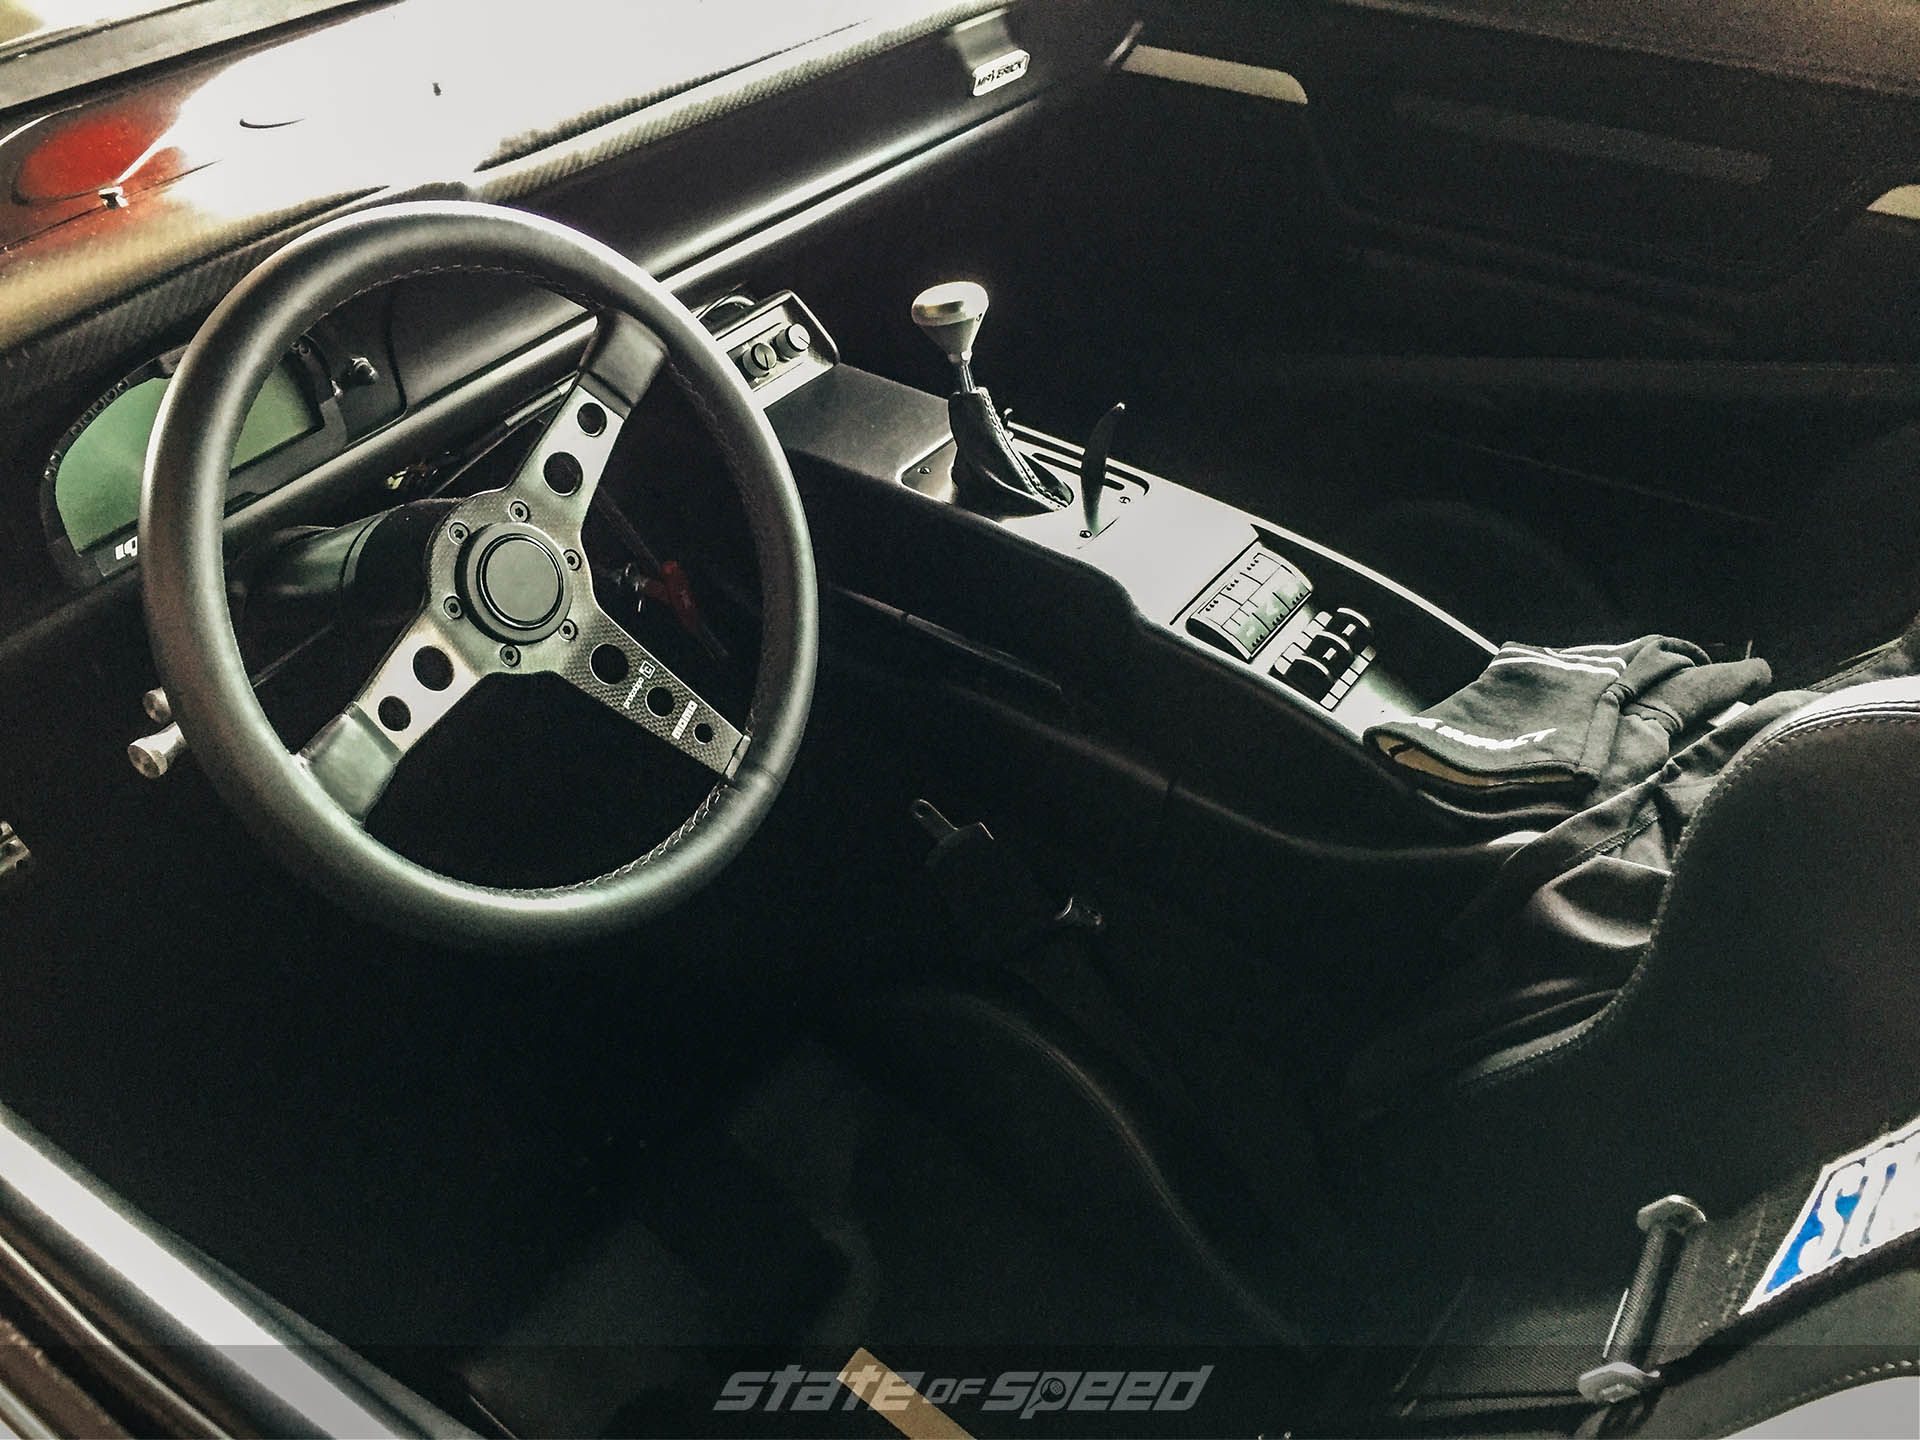 Ford Maverick interior with momo steering wheel